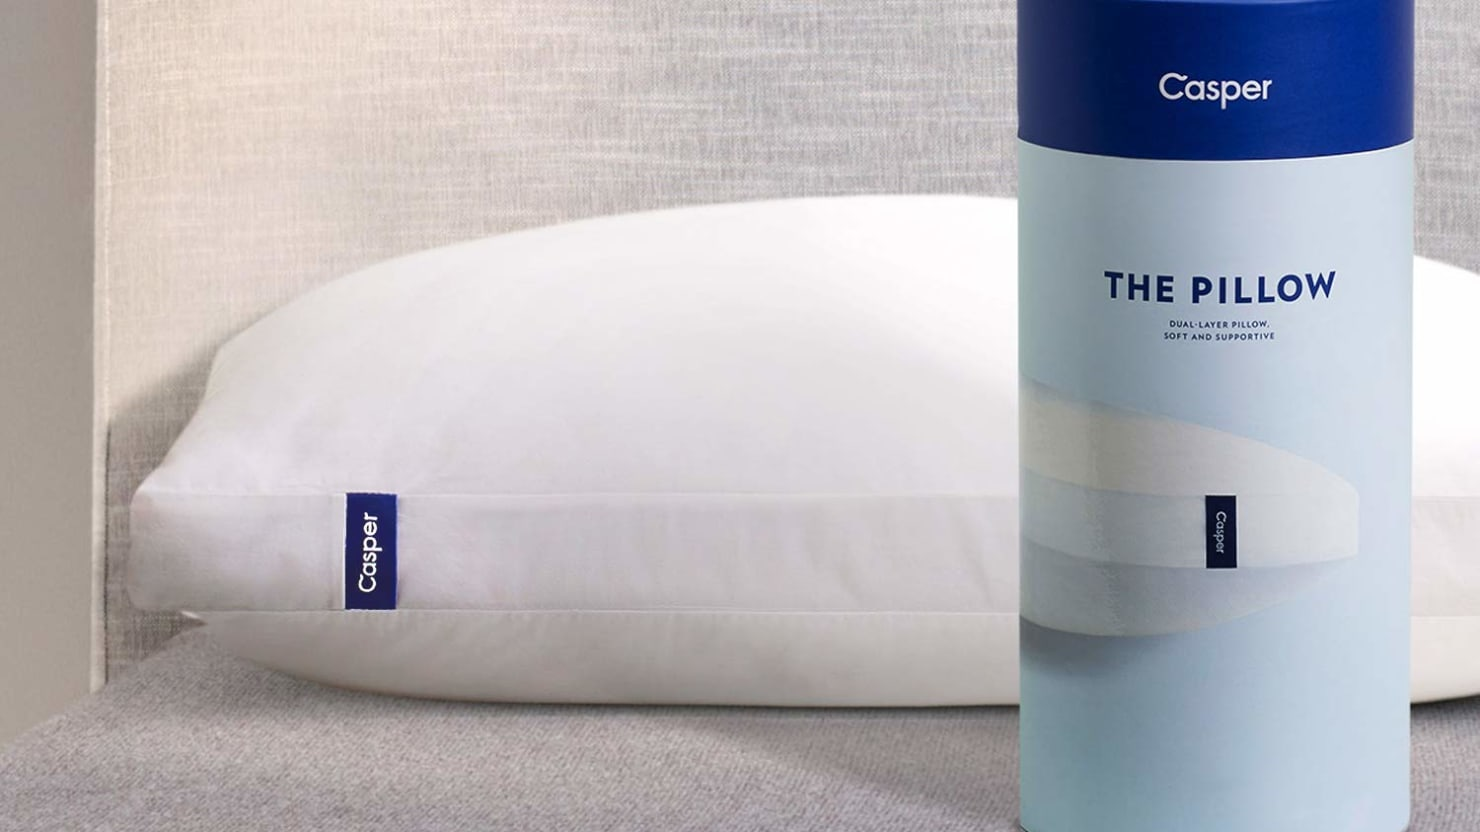 casper s pillow is the key to good sleep